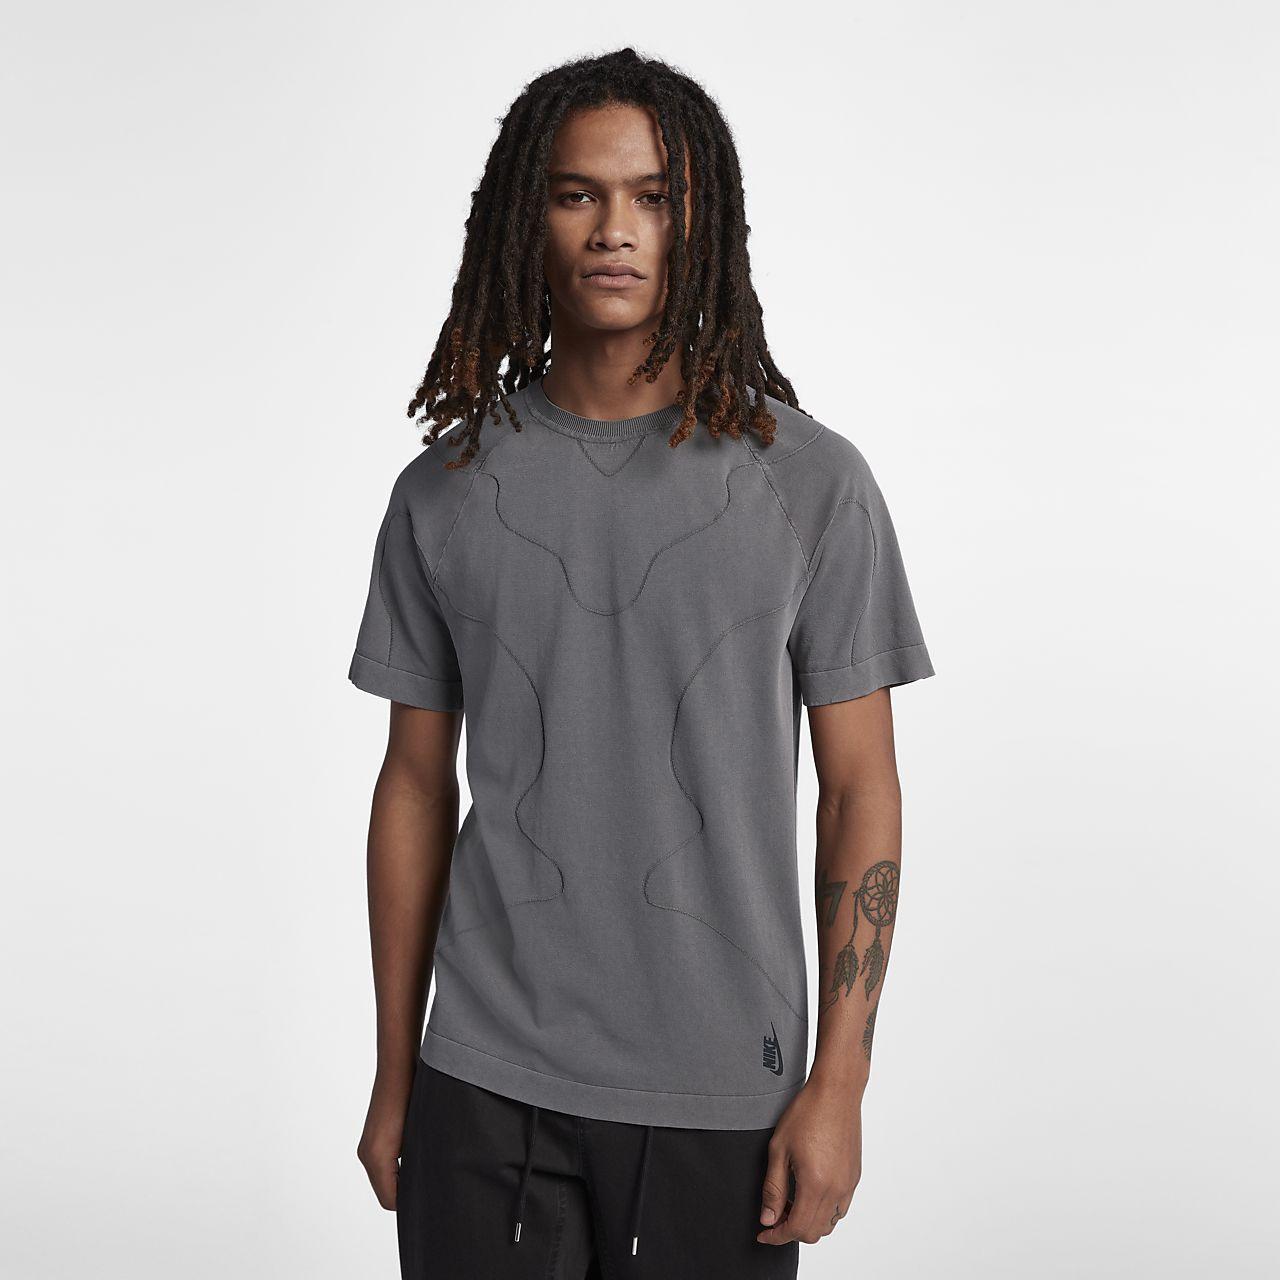 NikeLab Made in Italy Men's Short-Sleeve Top